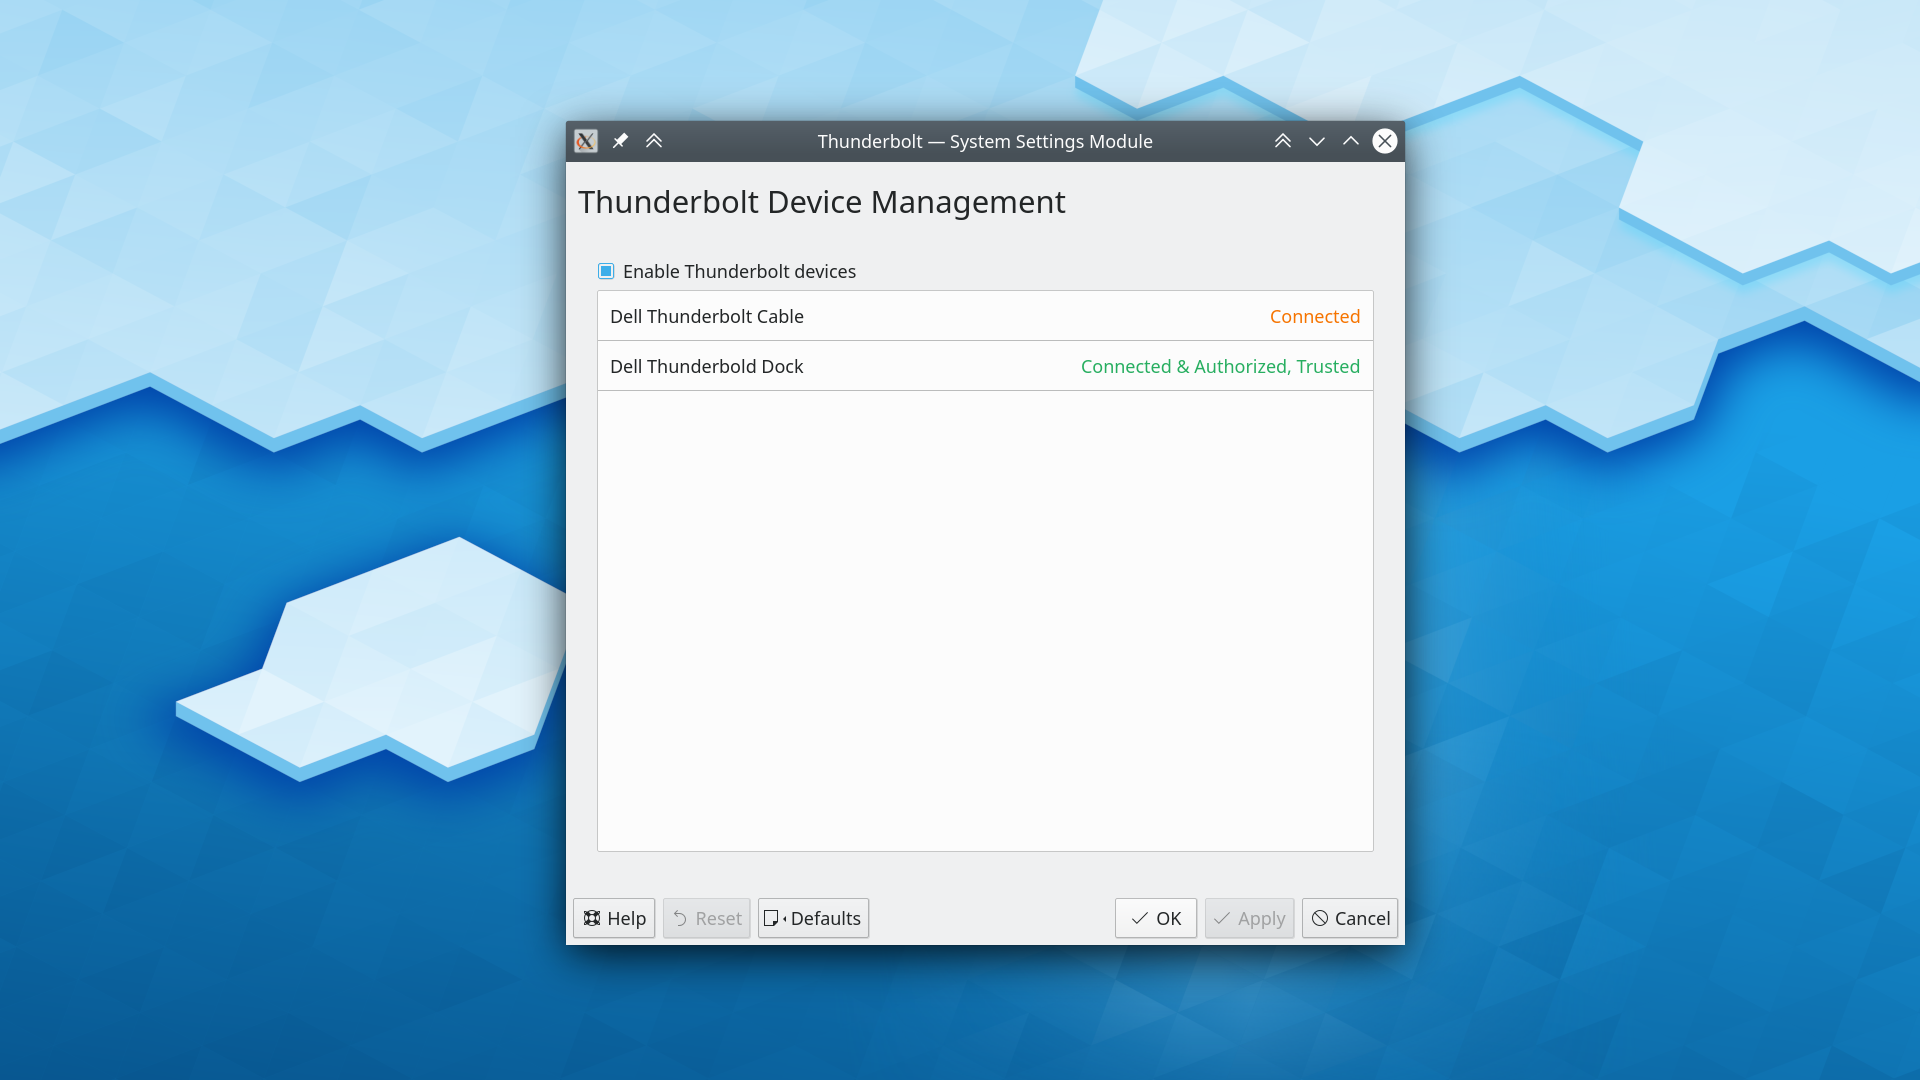 Thunderbolt device management